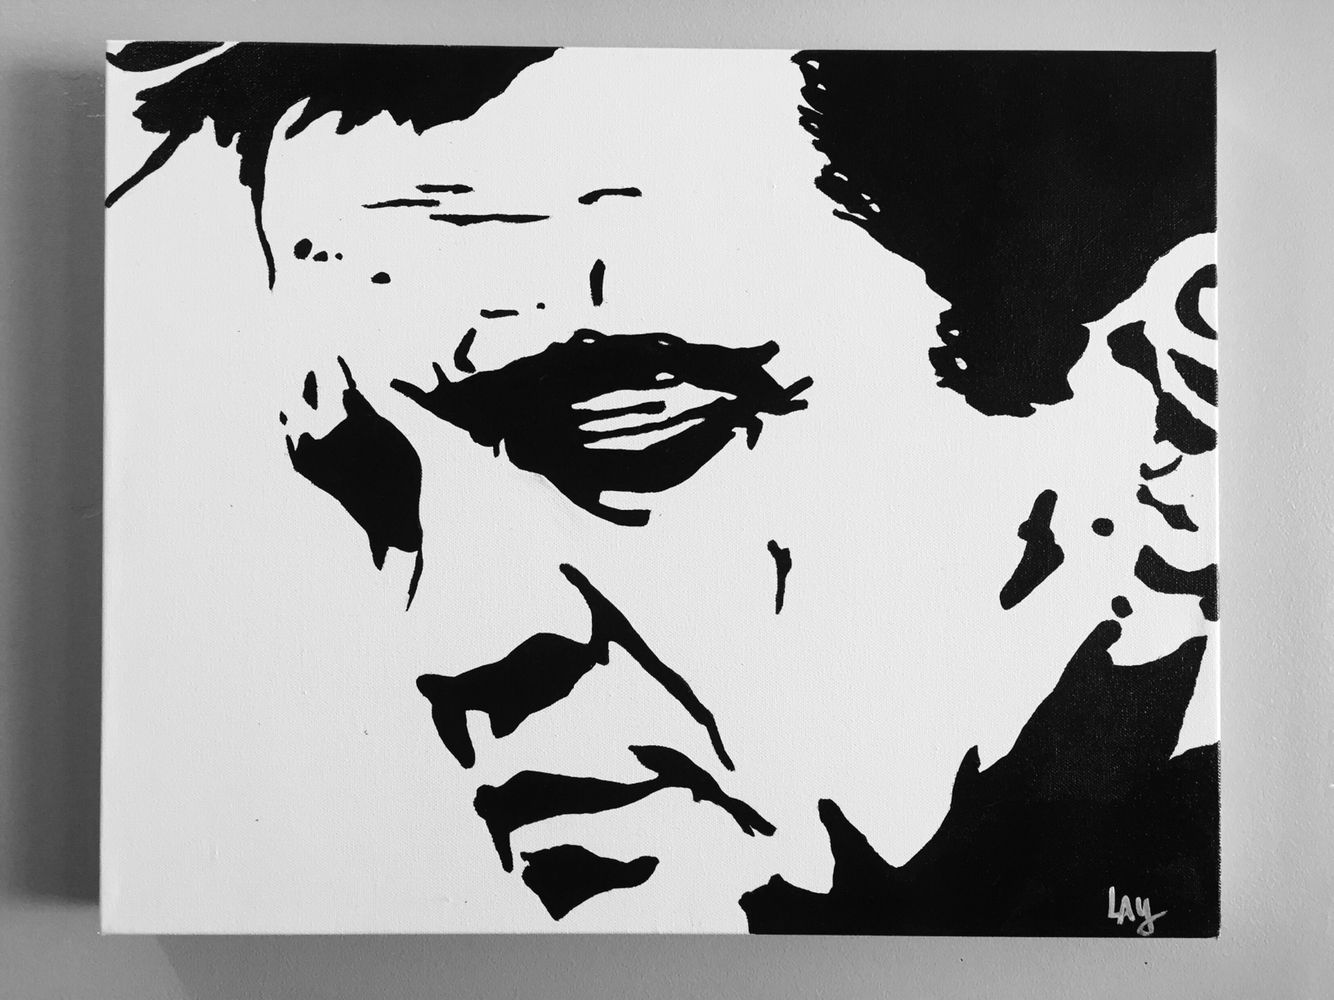 Johnny Cash Painting By Lay LayZArt JohnnyCash Nashville Legend